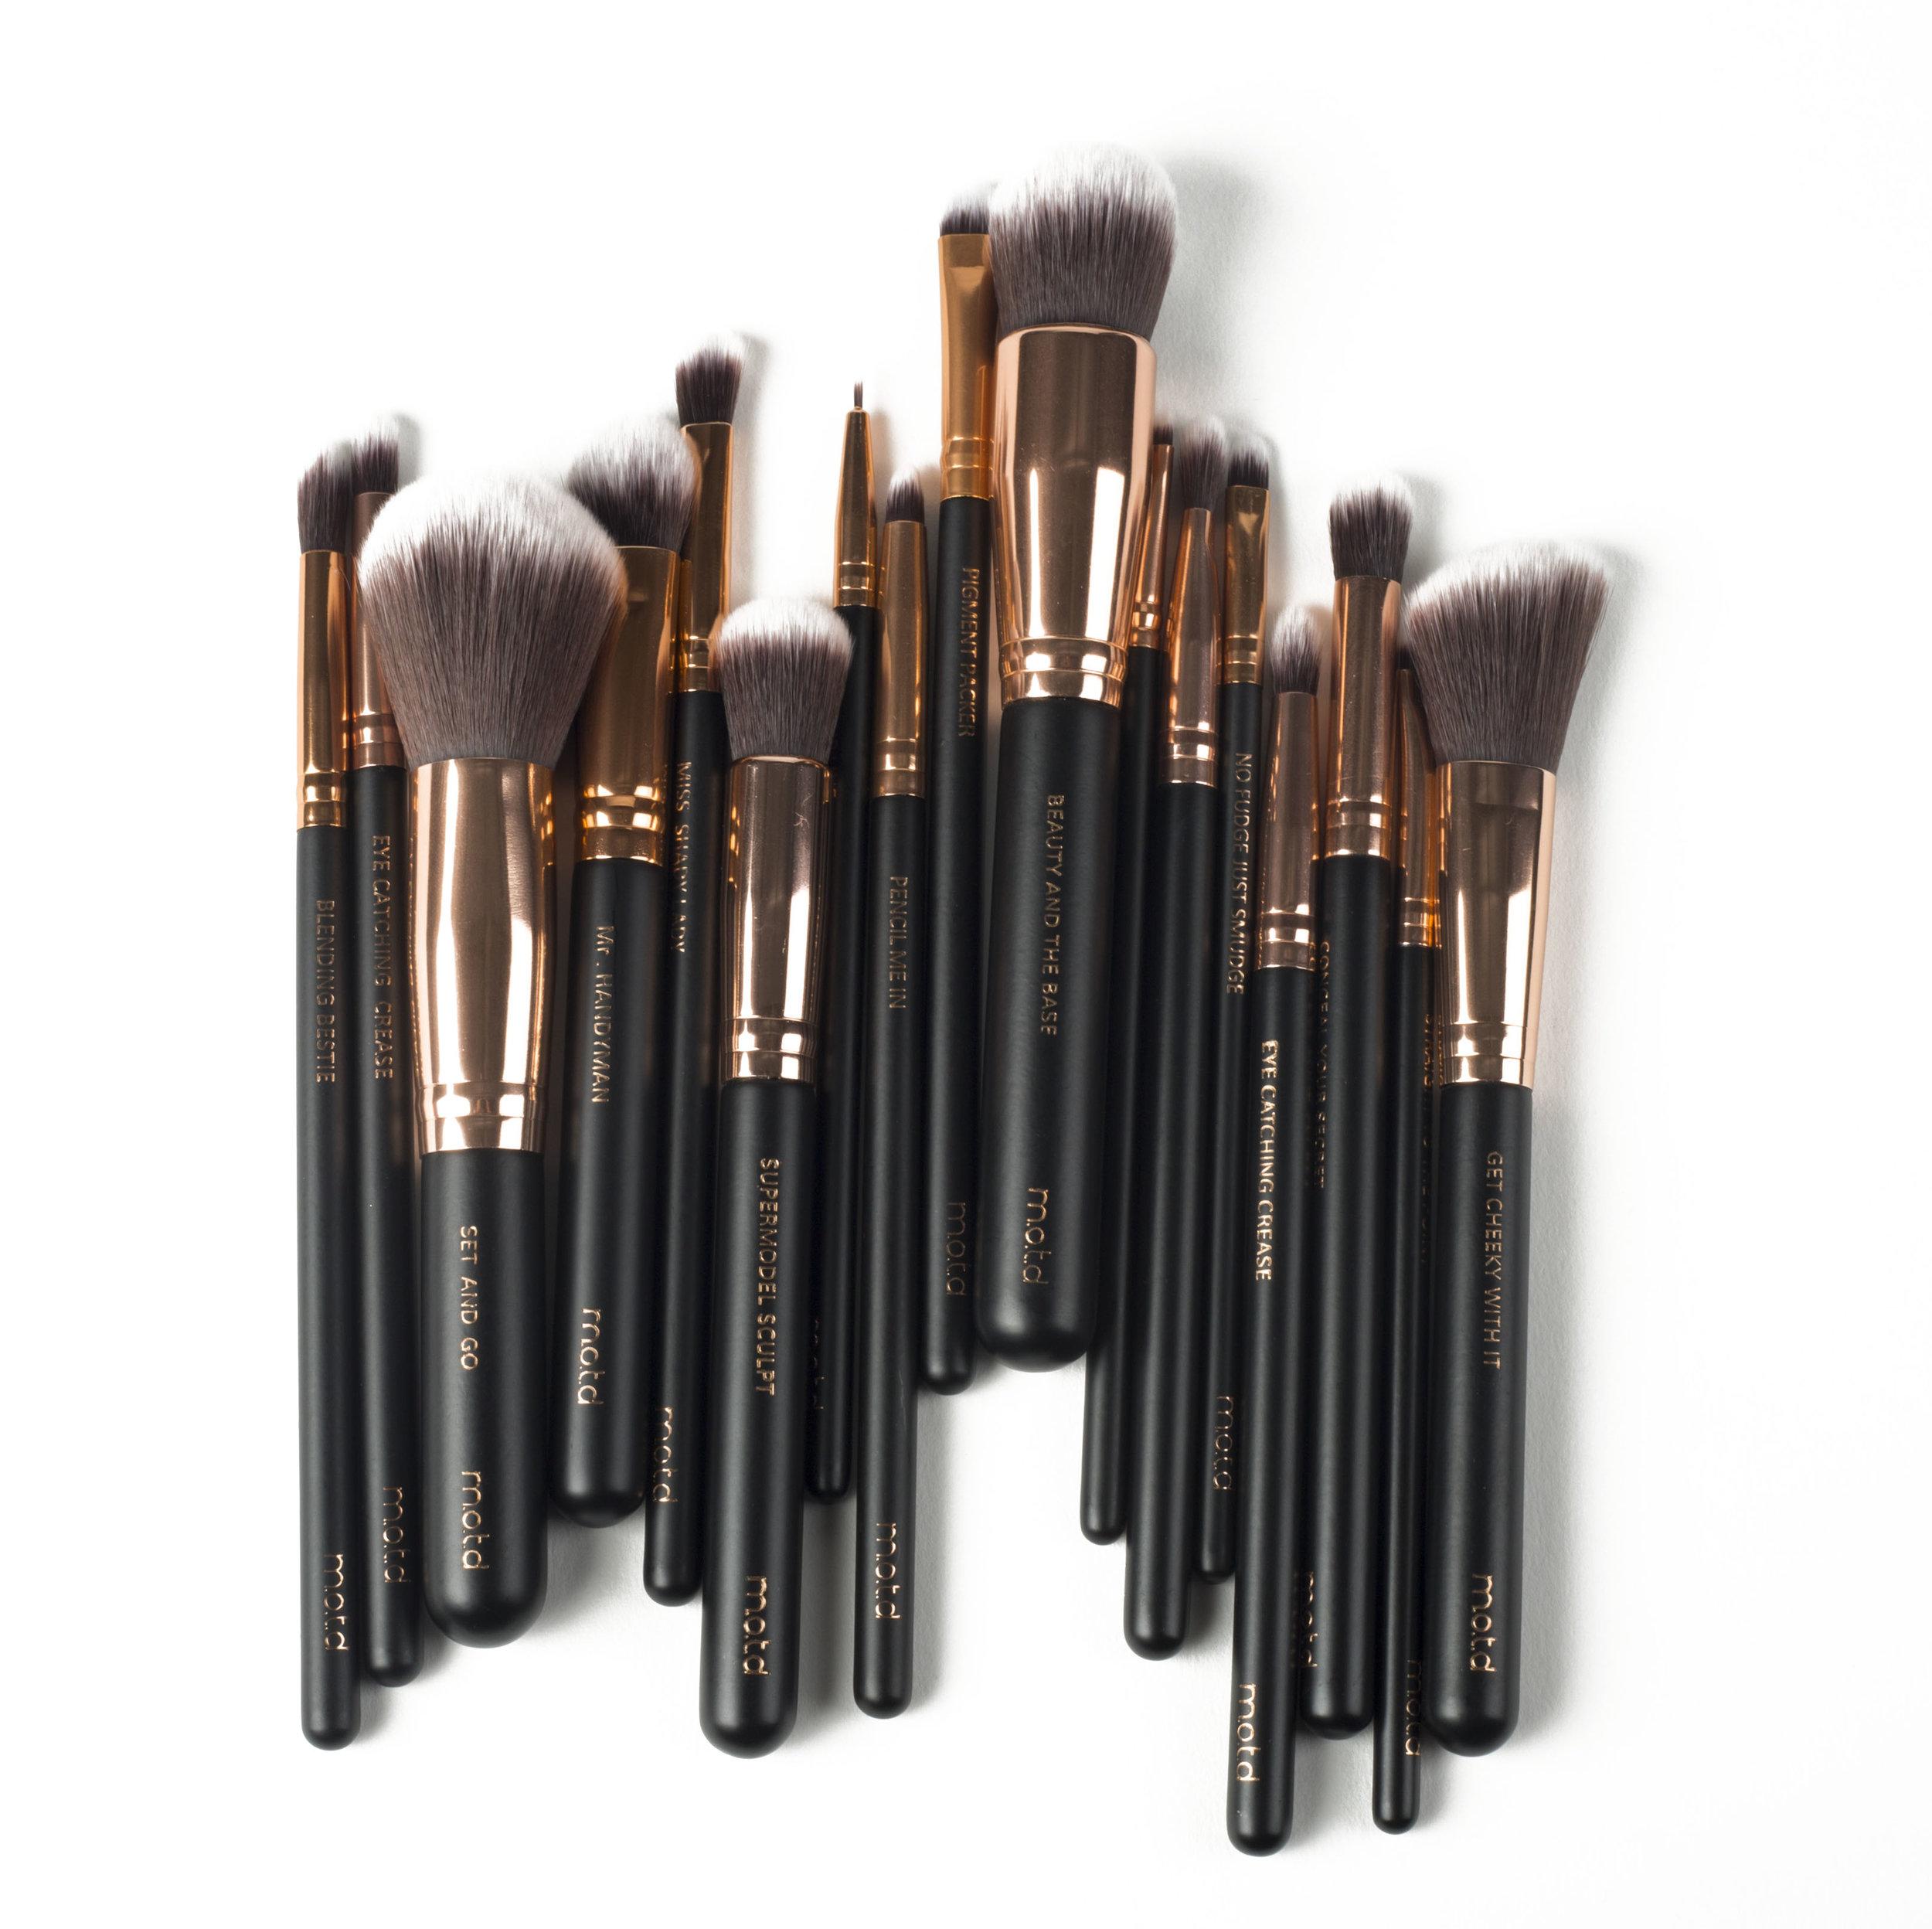 MOTD_Cosmetics-1.jpg